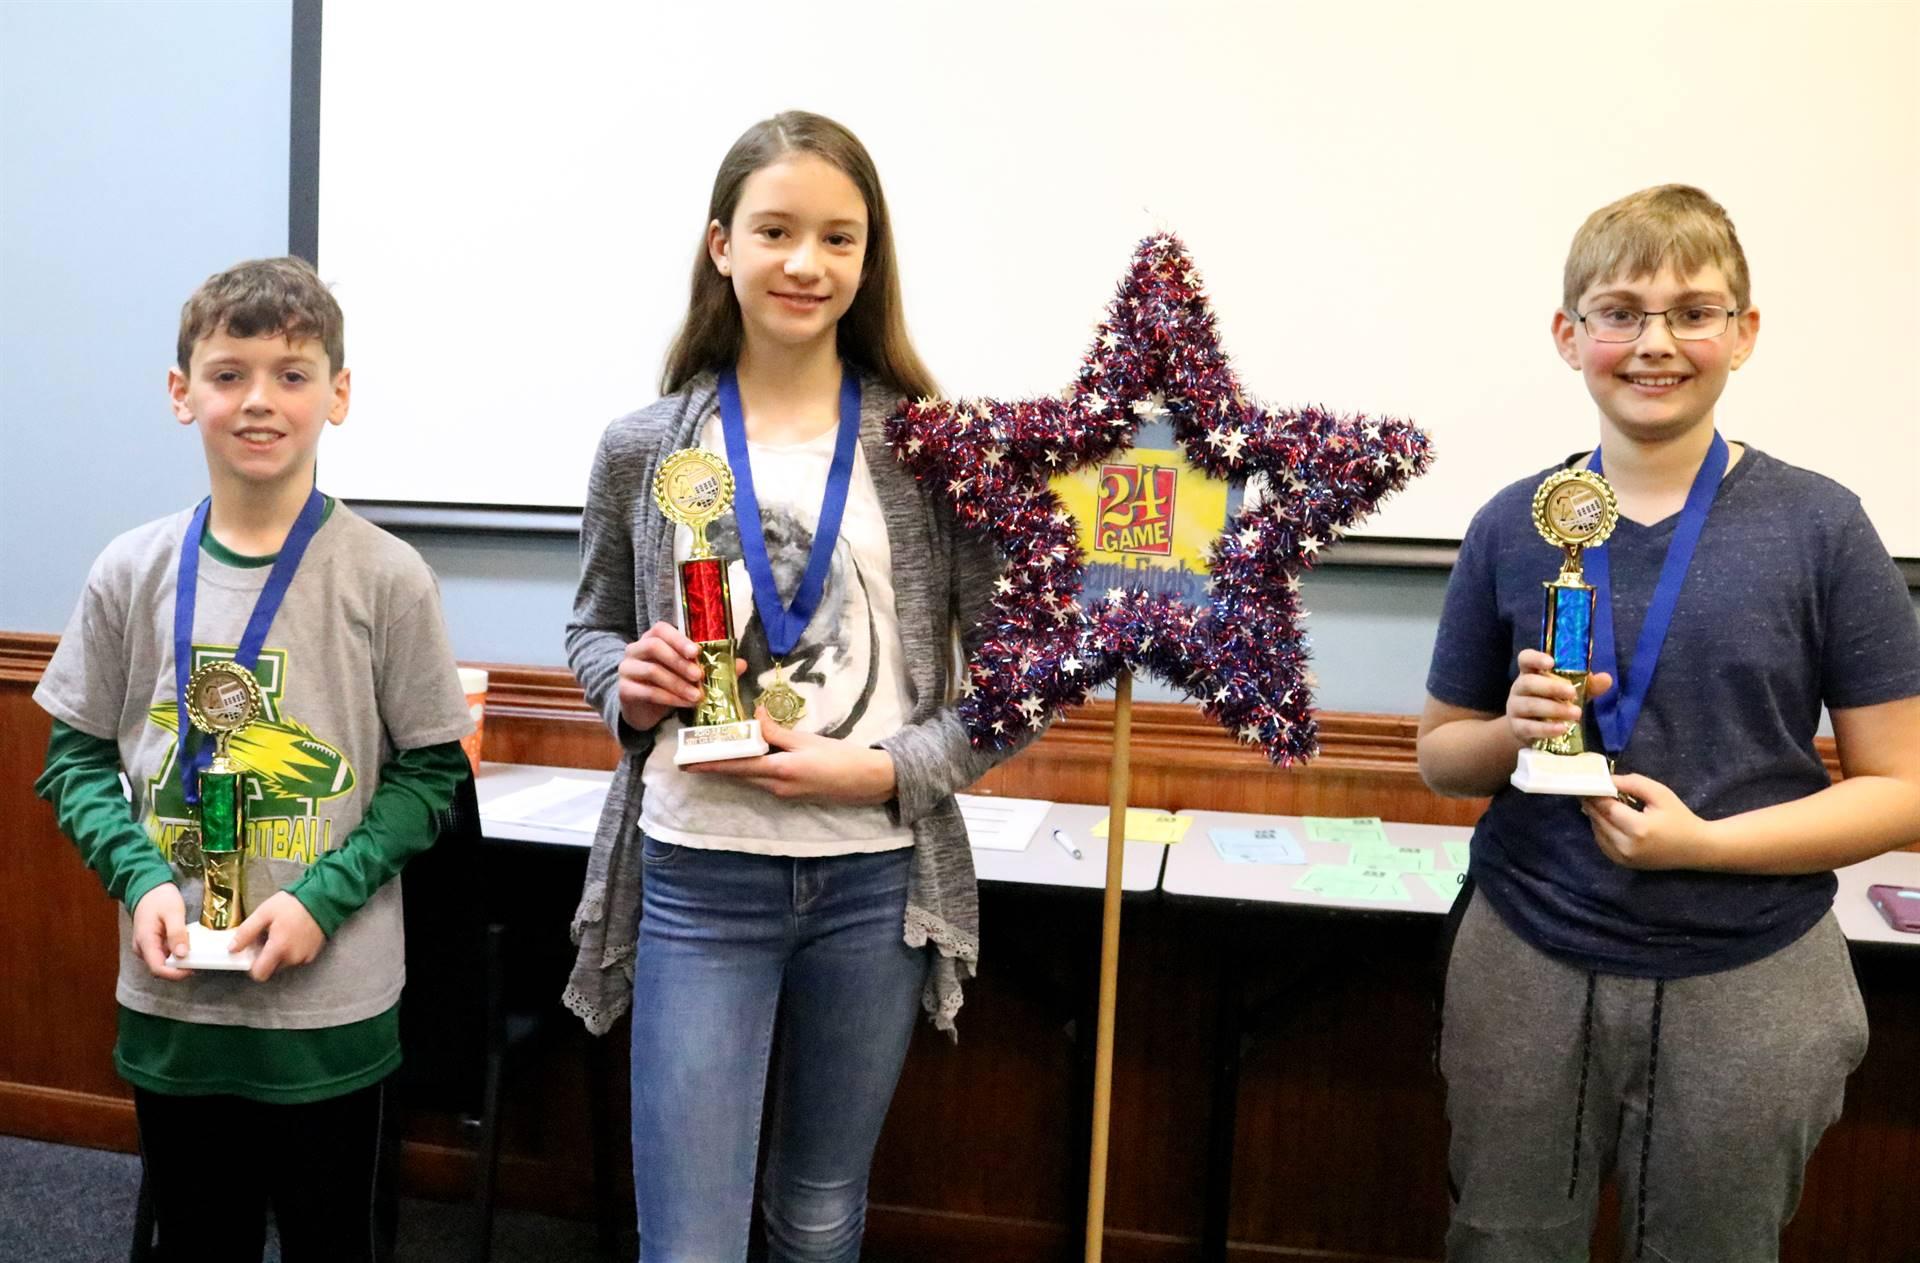 2 boys, 1 girls holding trophies